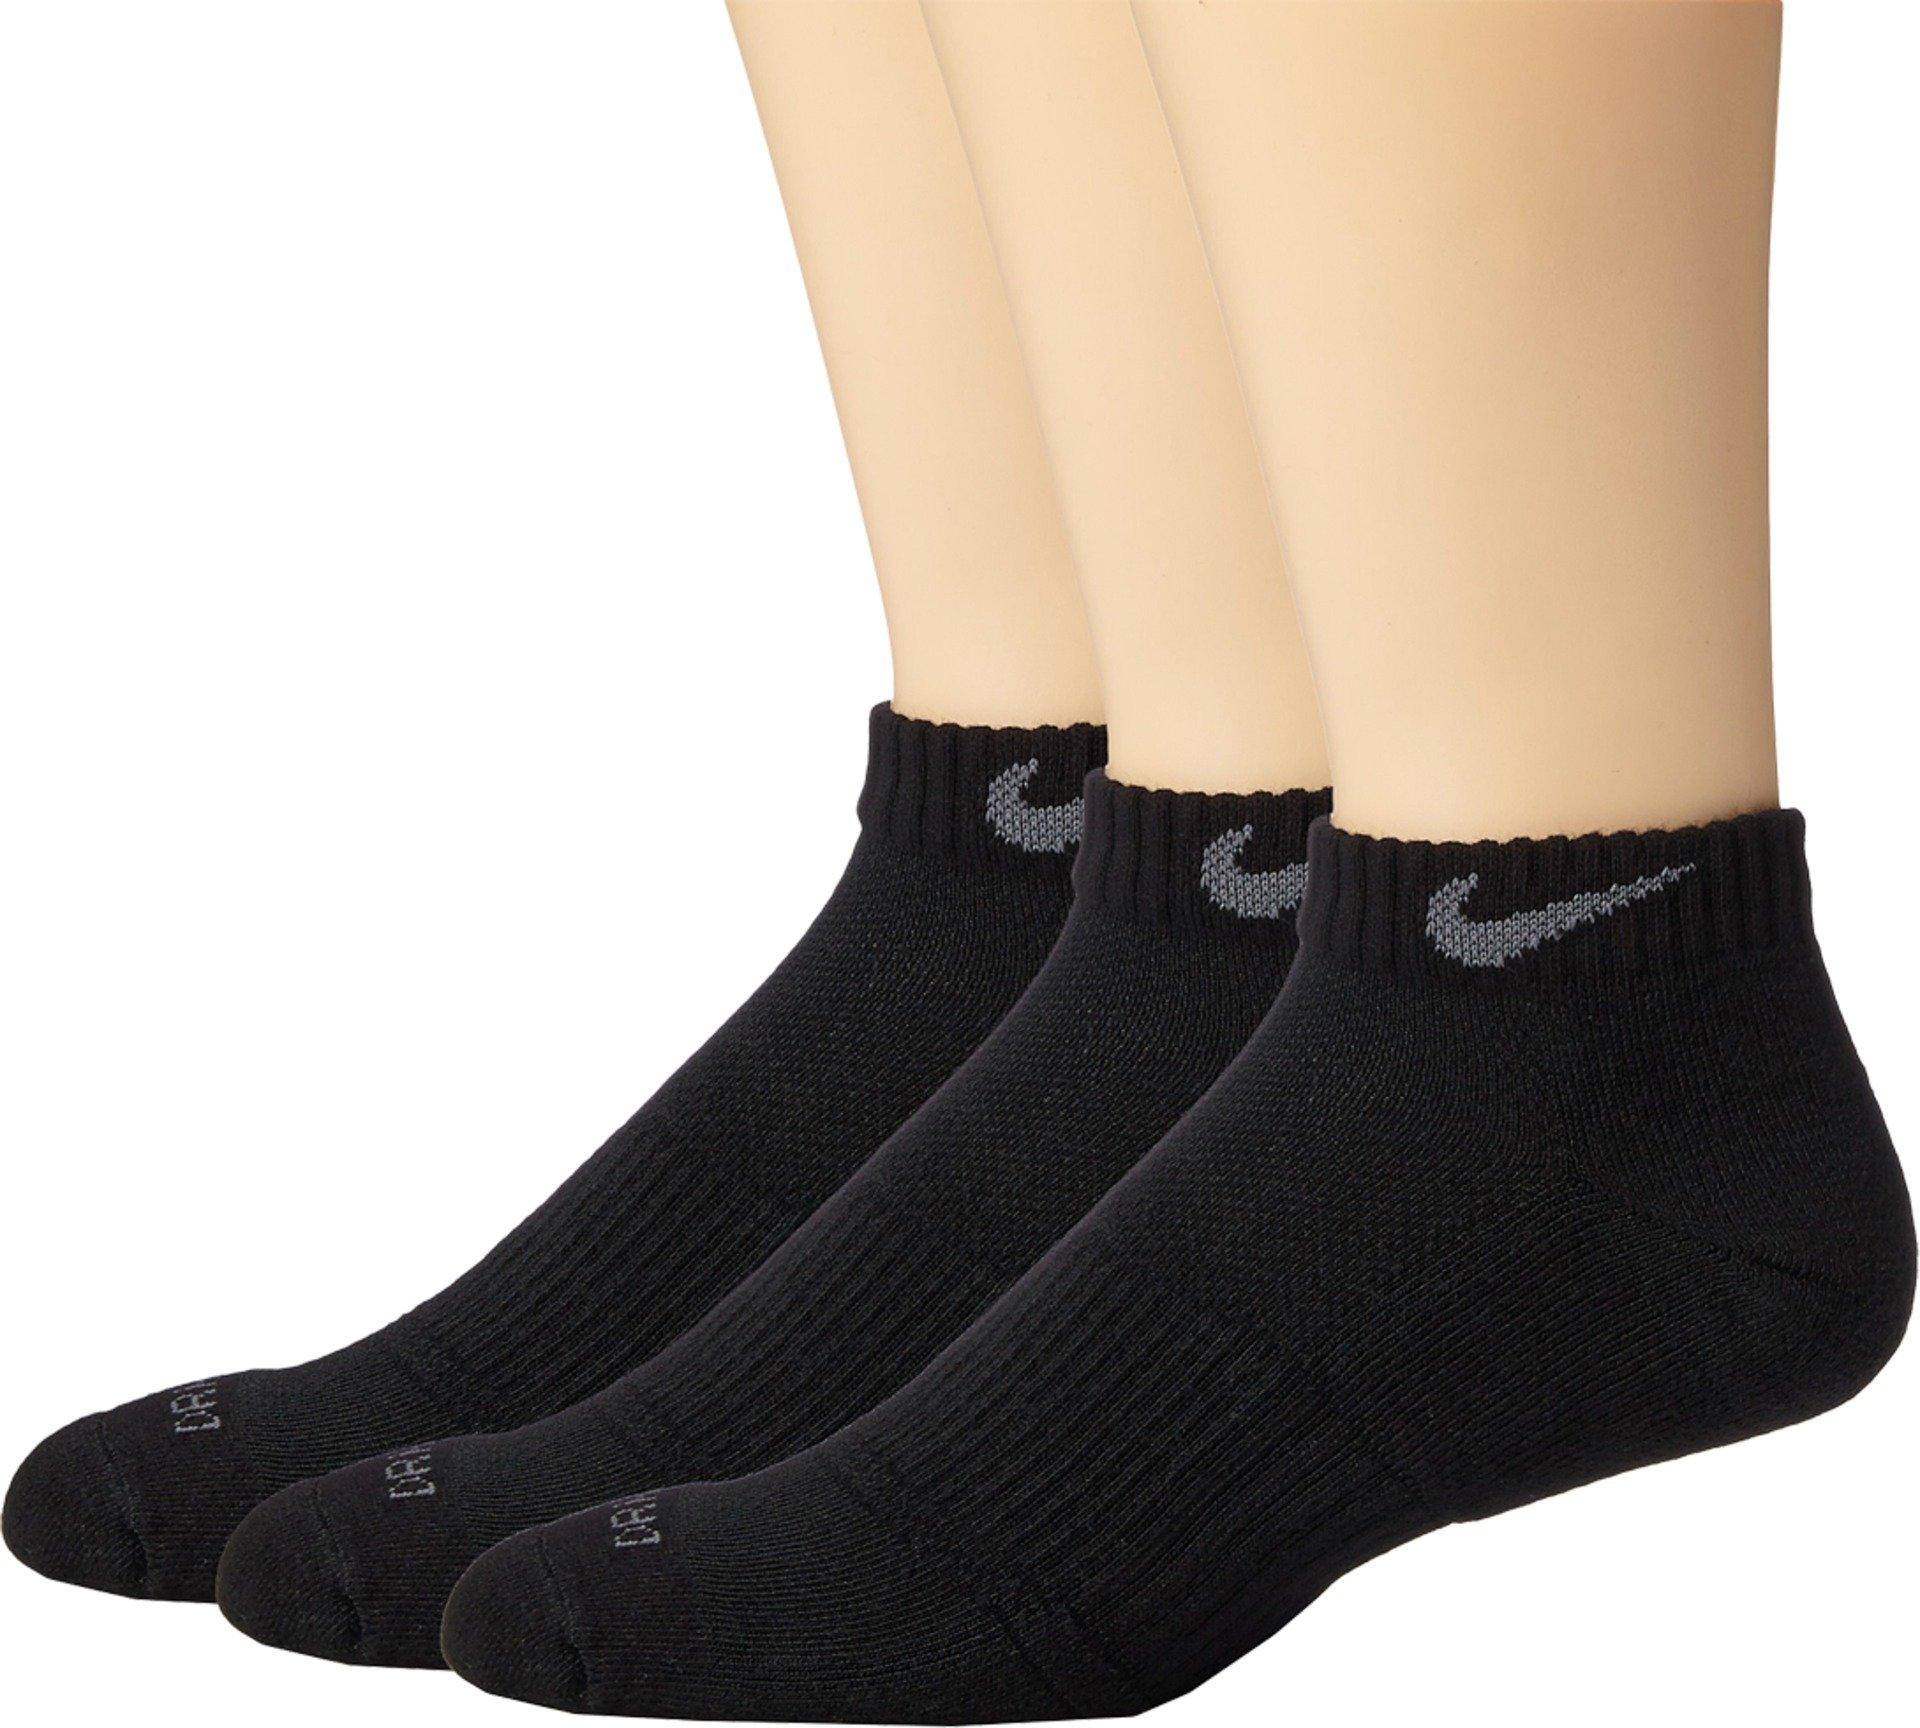 Nike Unisex Dry Cushion Low Training Sock (3 Pair) (Black/Flint Grey, Small)